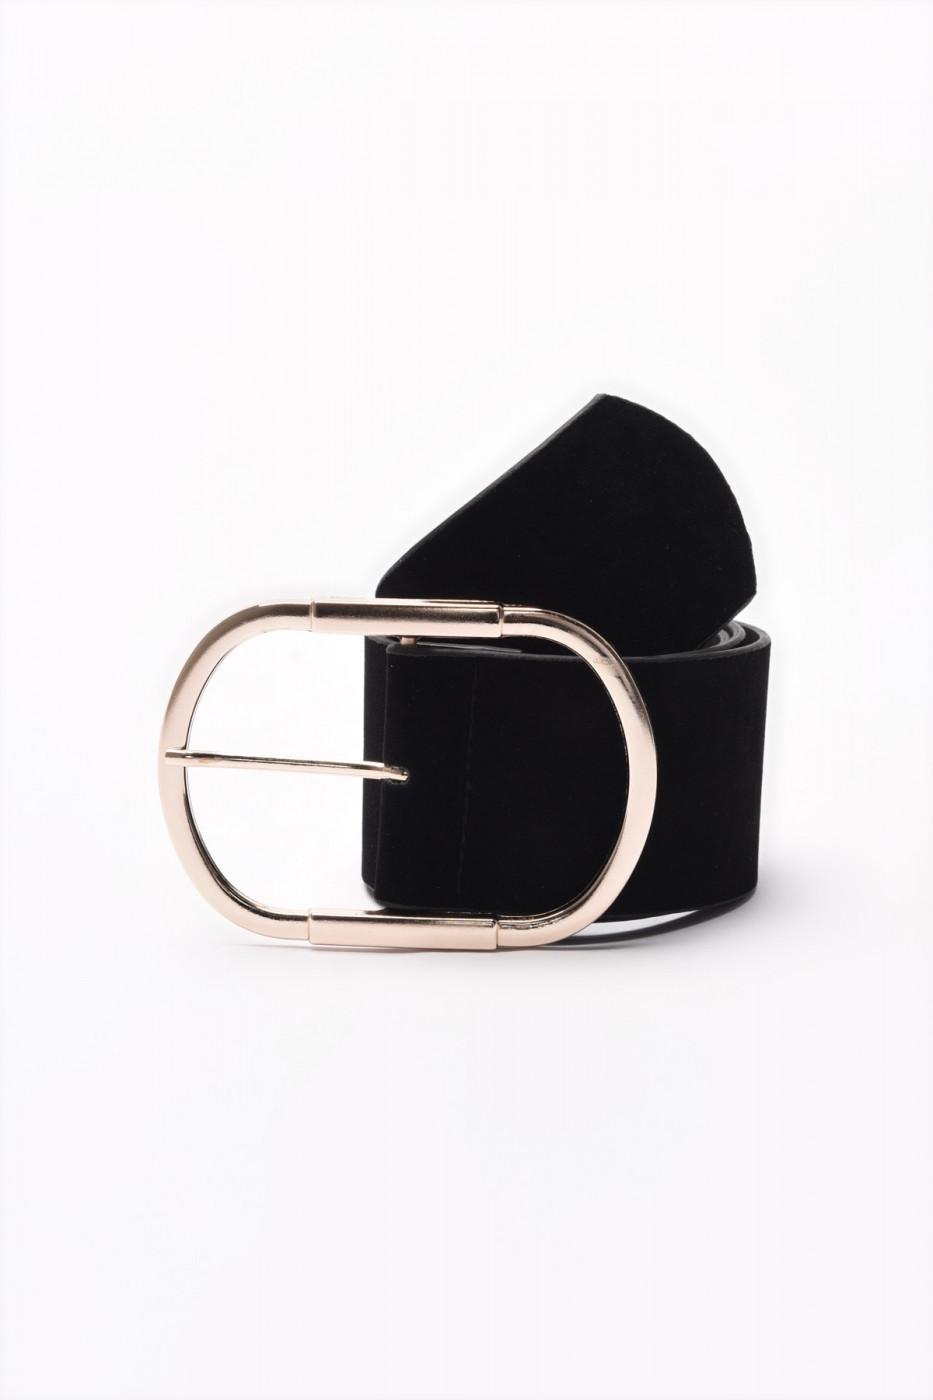 Trendyol Black Metal Buckle Leather Belt